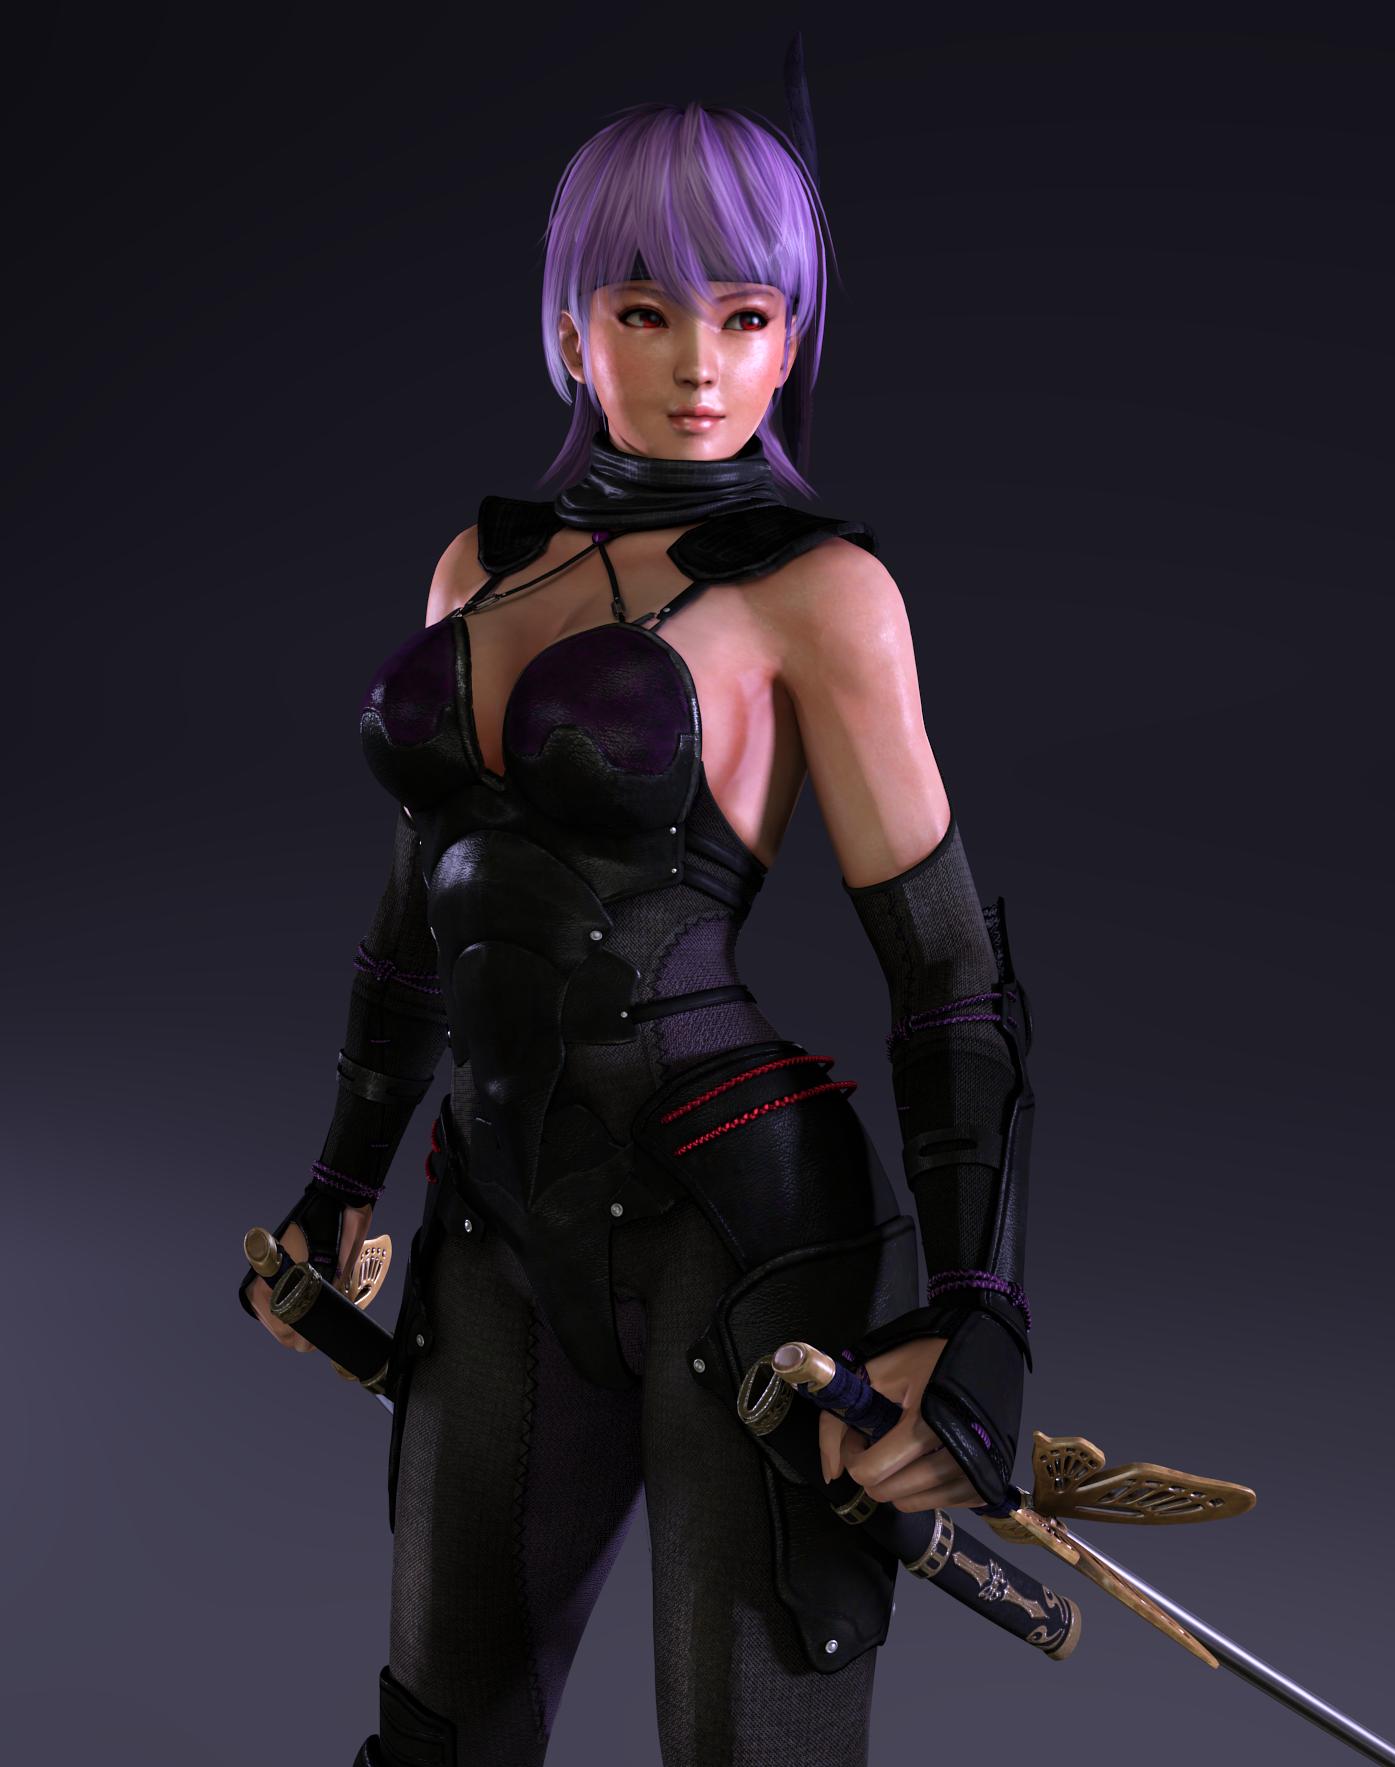 Ayane ninja gaiden 3 razor's edge - Render17 by Dizzy-XD on DeviantArt  Ayane ninja gai...